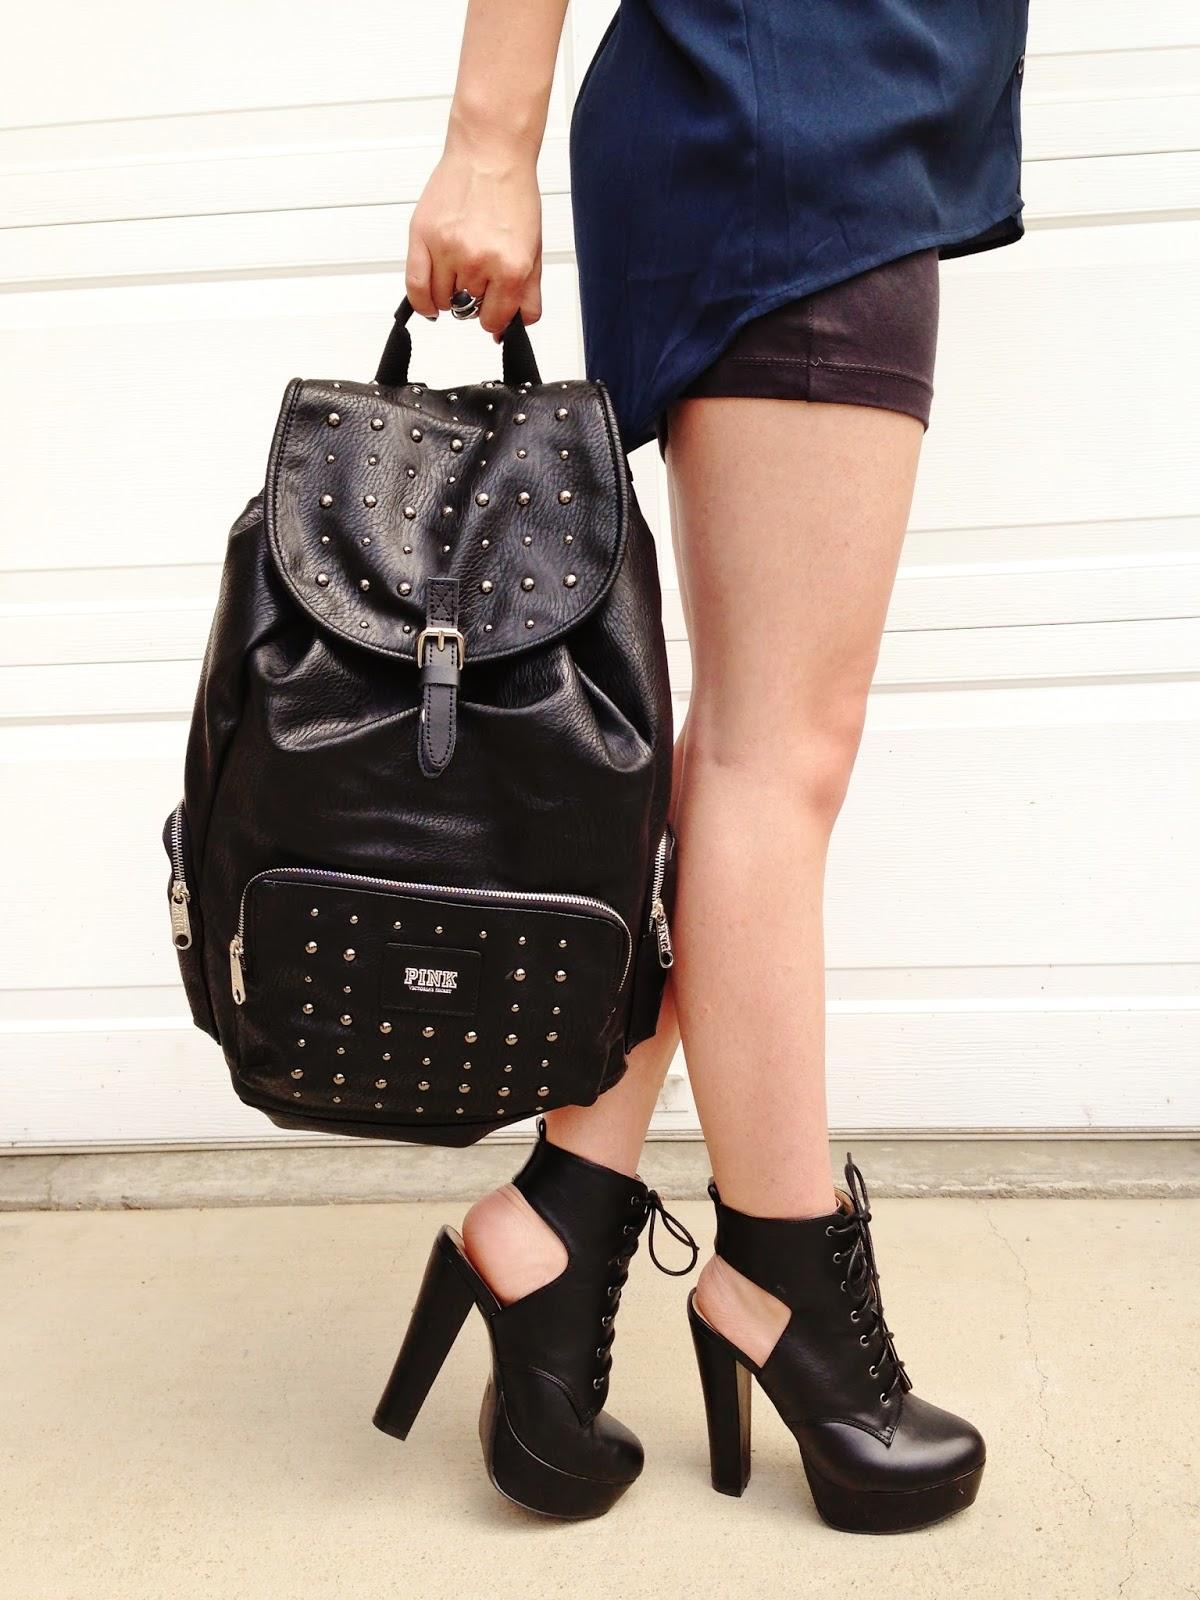 Black mini skirt outfit ideas